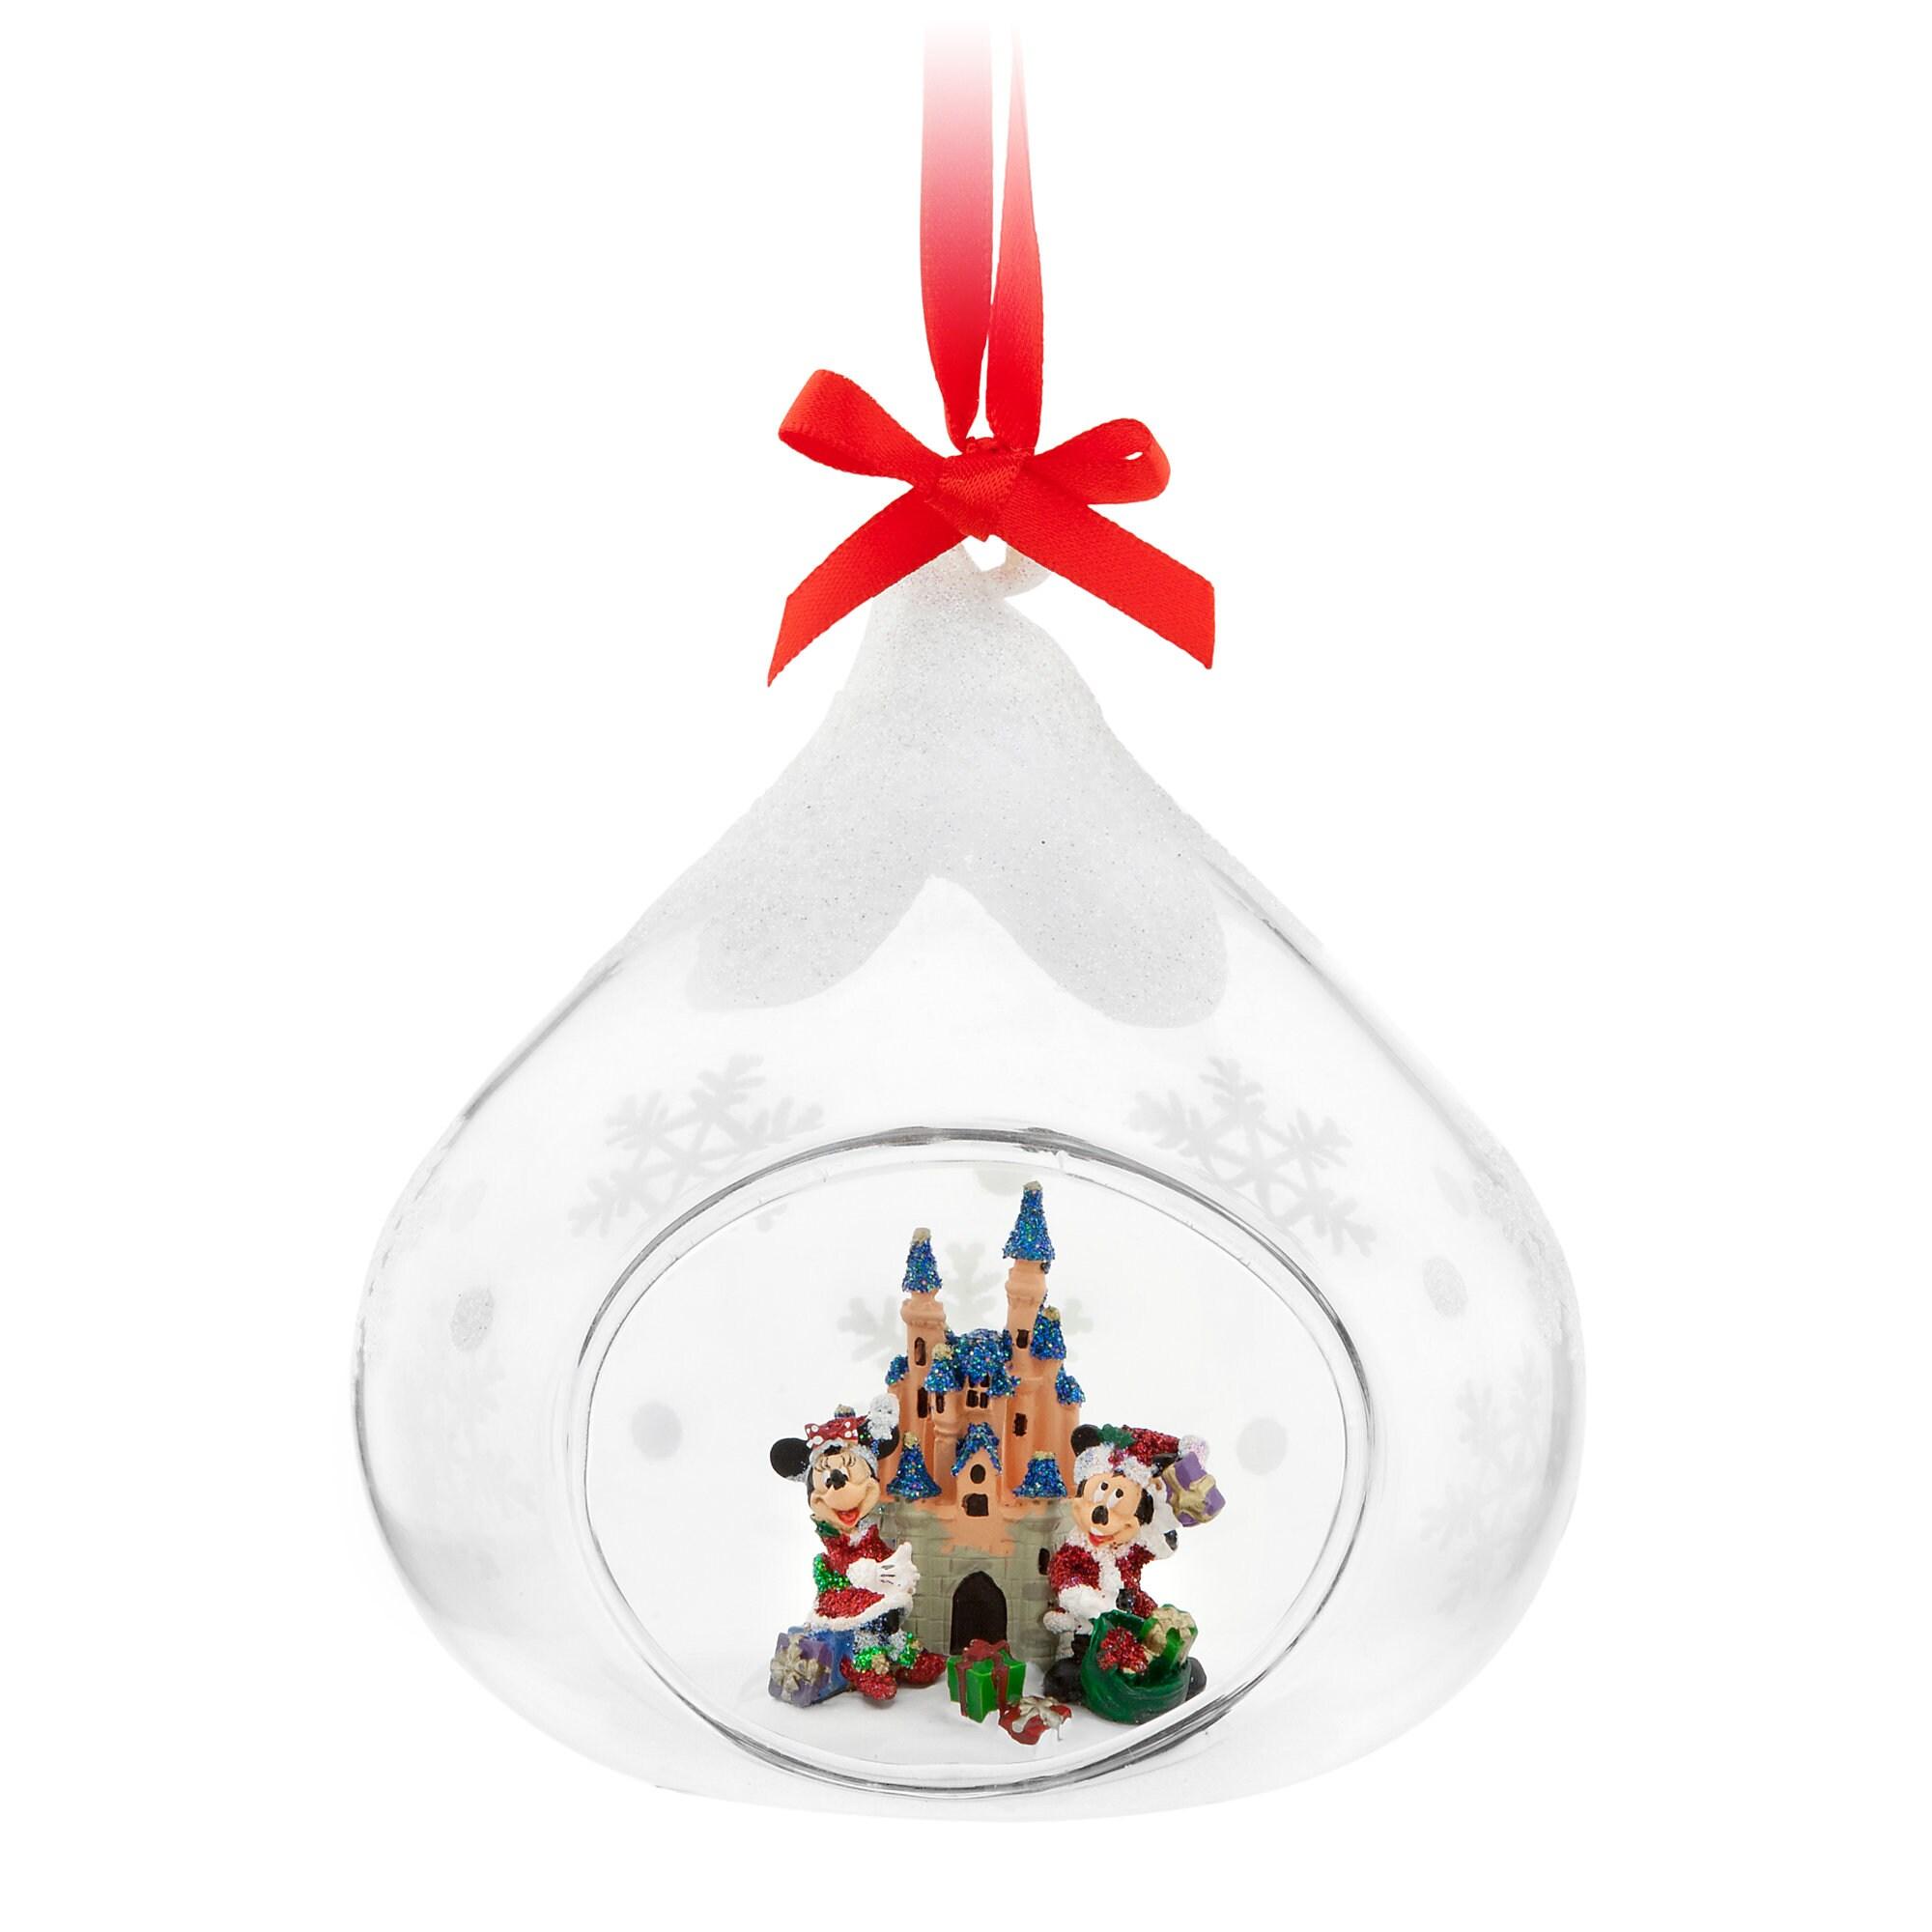 Santa Mickey and Minnie Mouse Glass Ornament - Disneyland